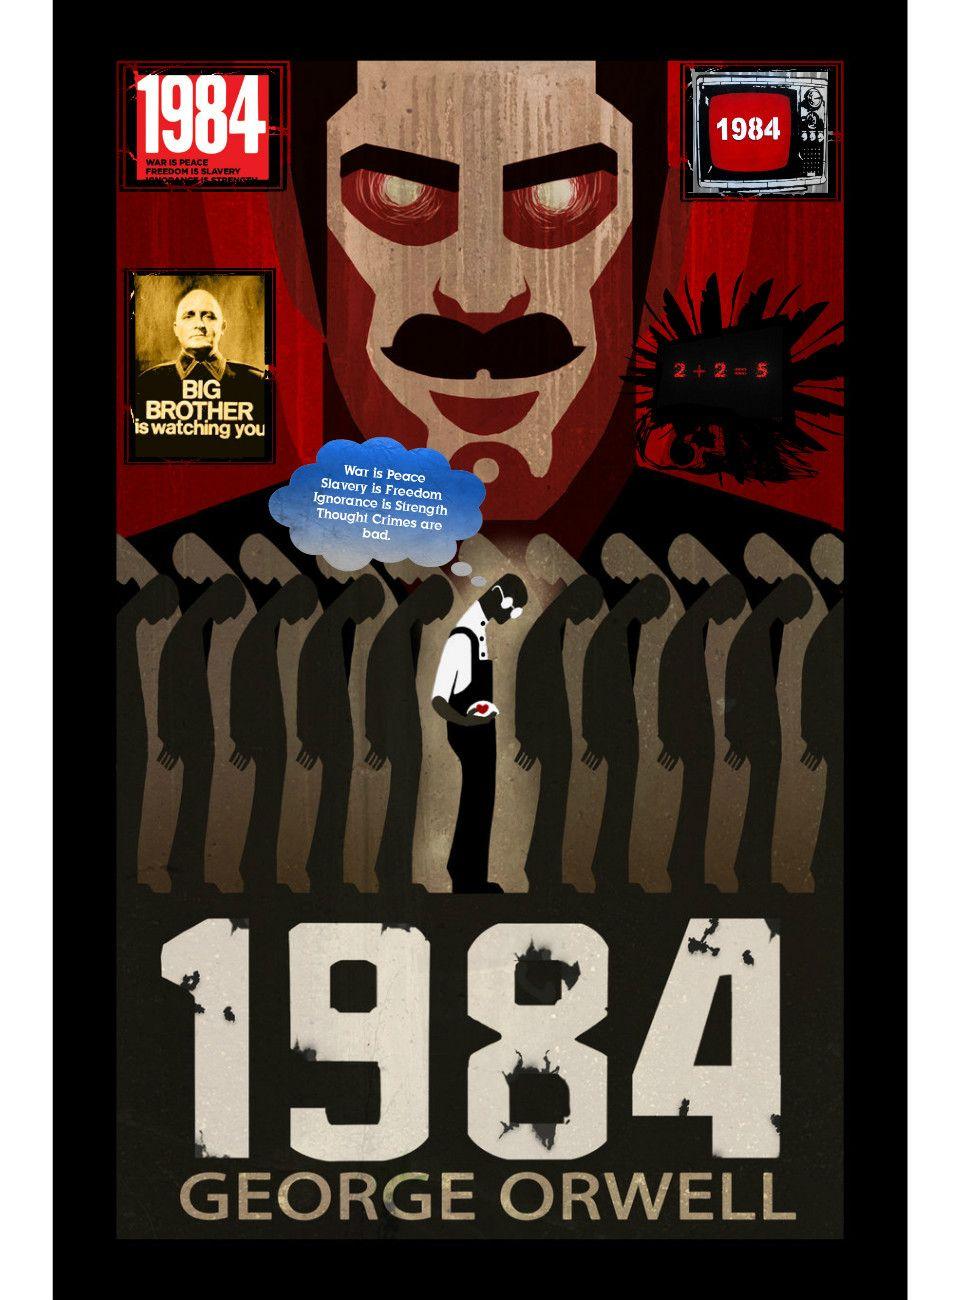 1984 (8 de junio 1949) de George Orwell.